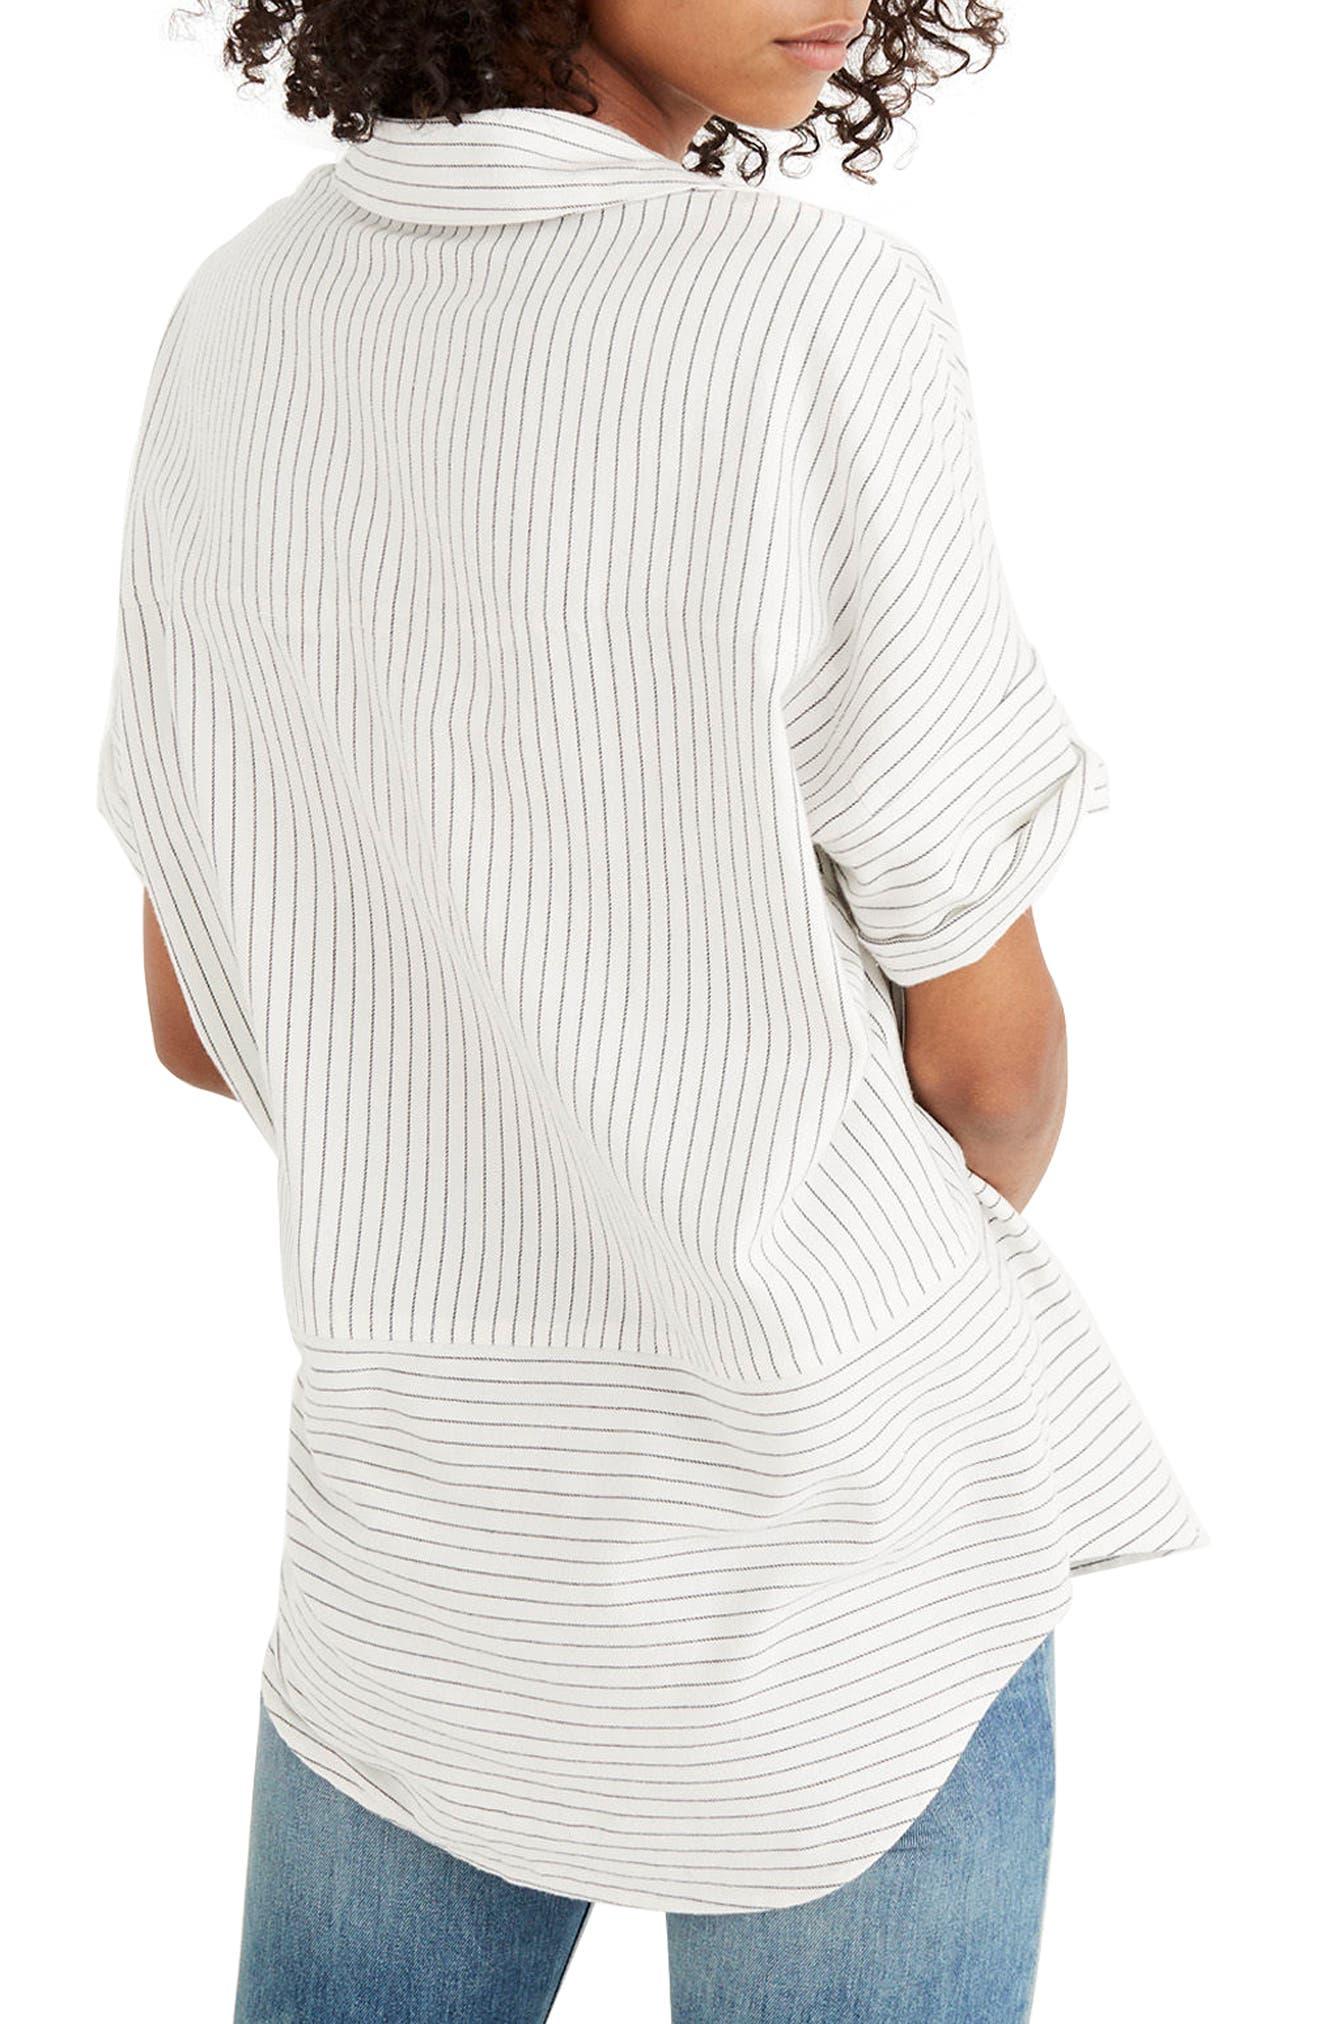 Flannel Courier Shirt,                             Alternate thumbnail 2, color,